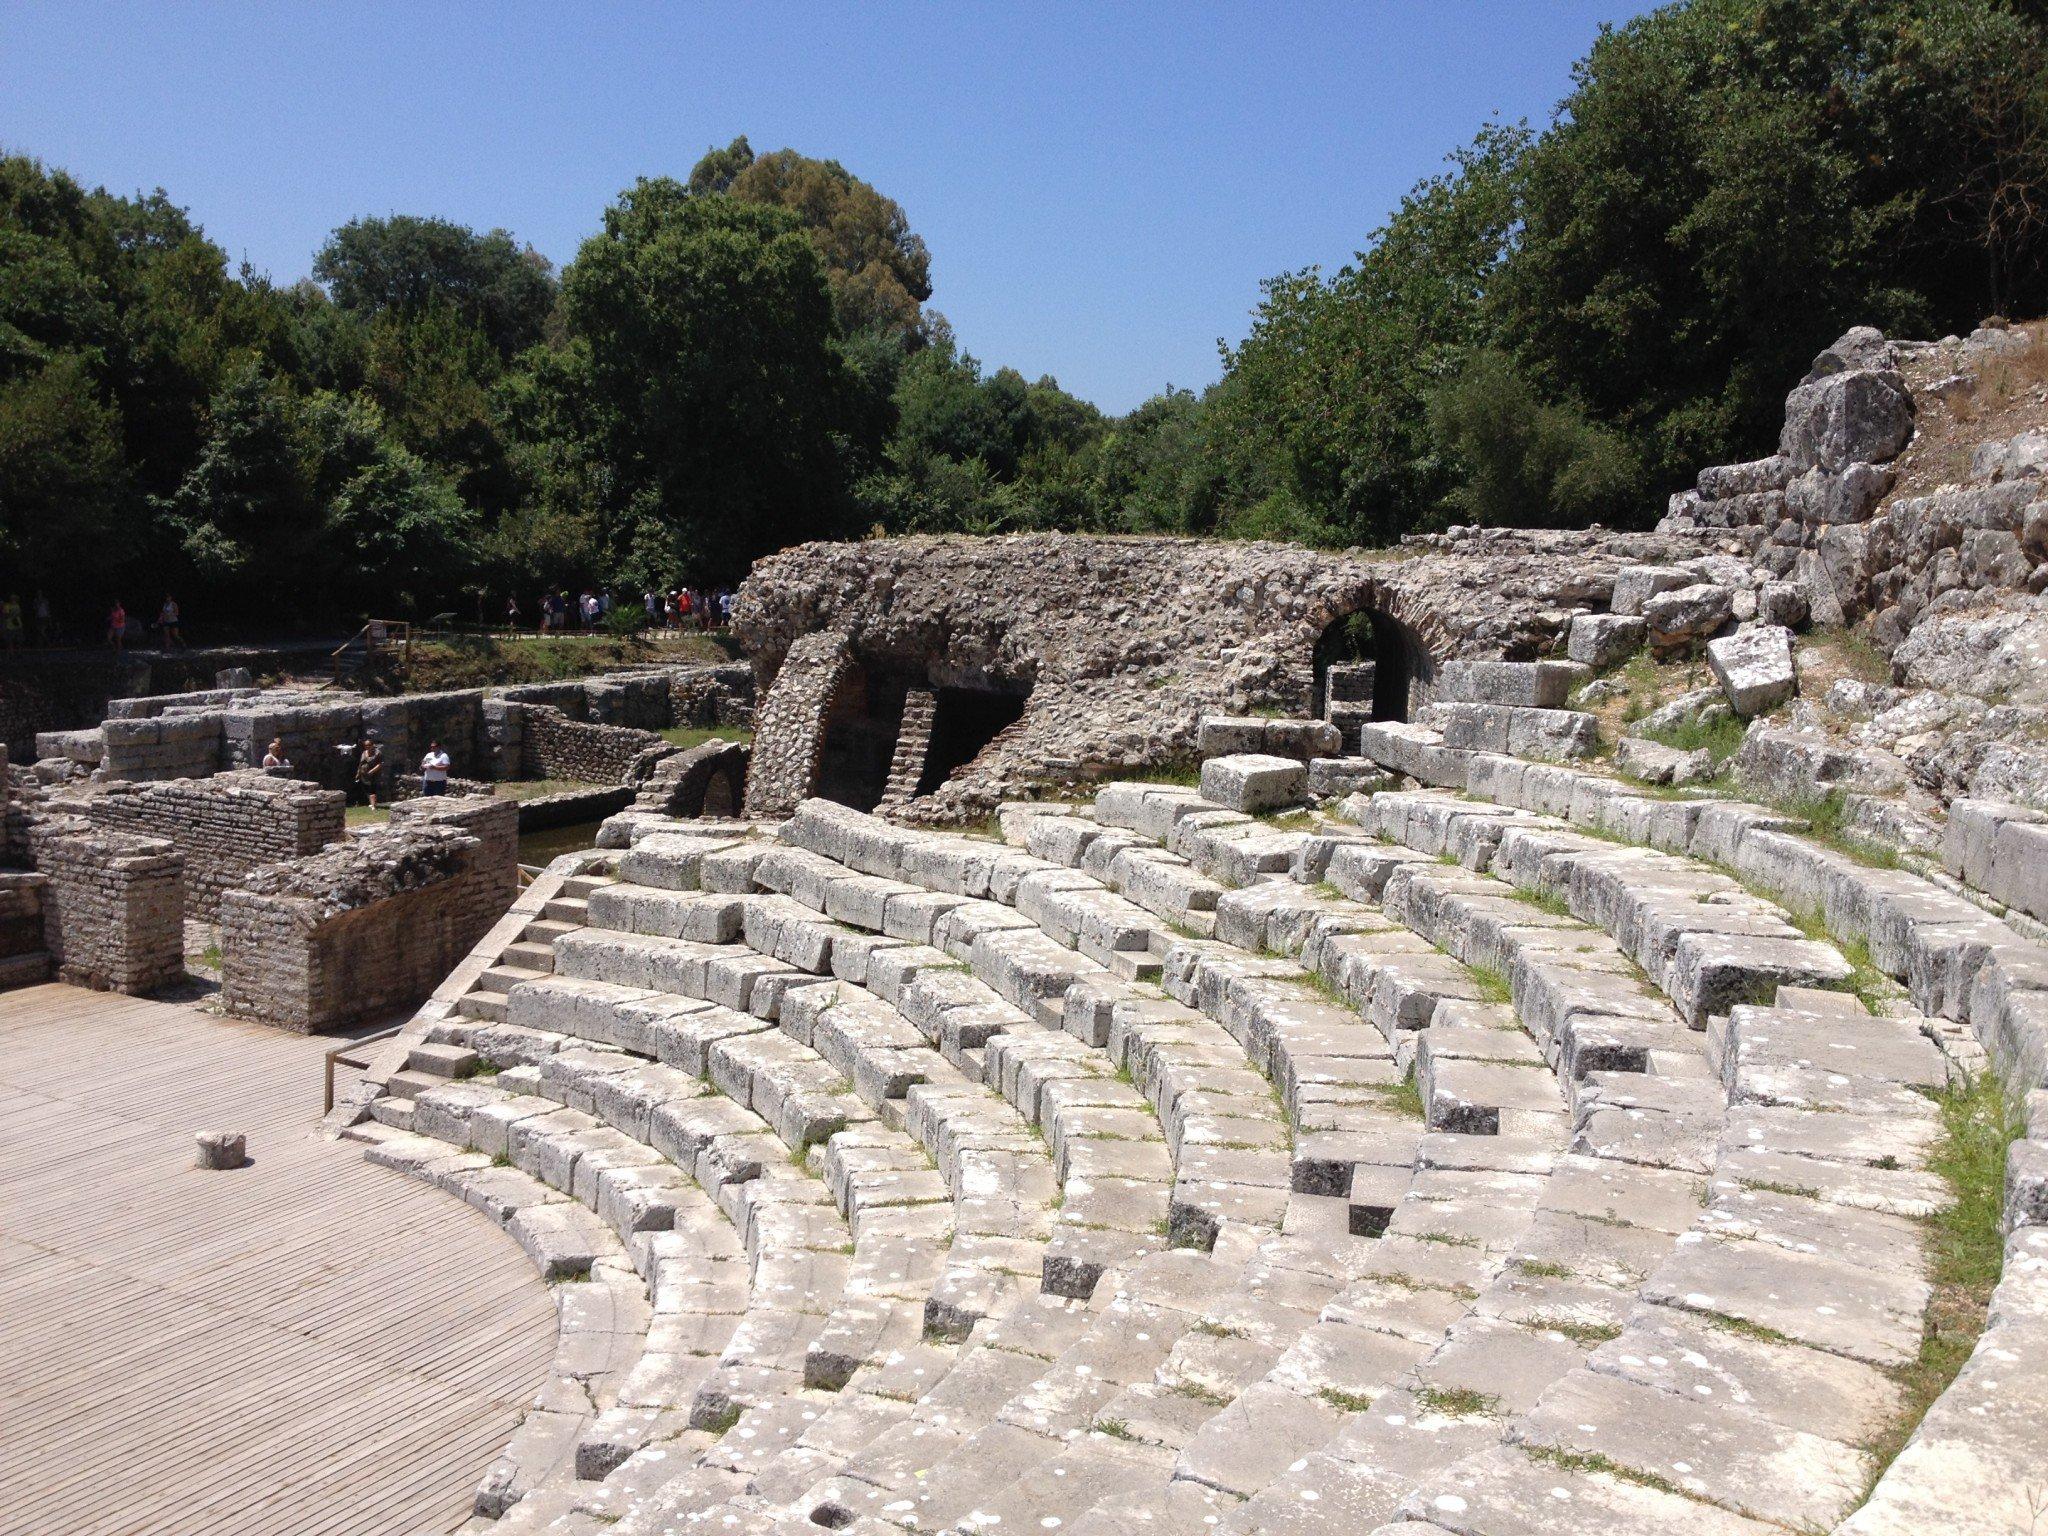 Butrintin amfiteatteri